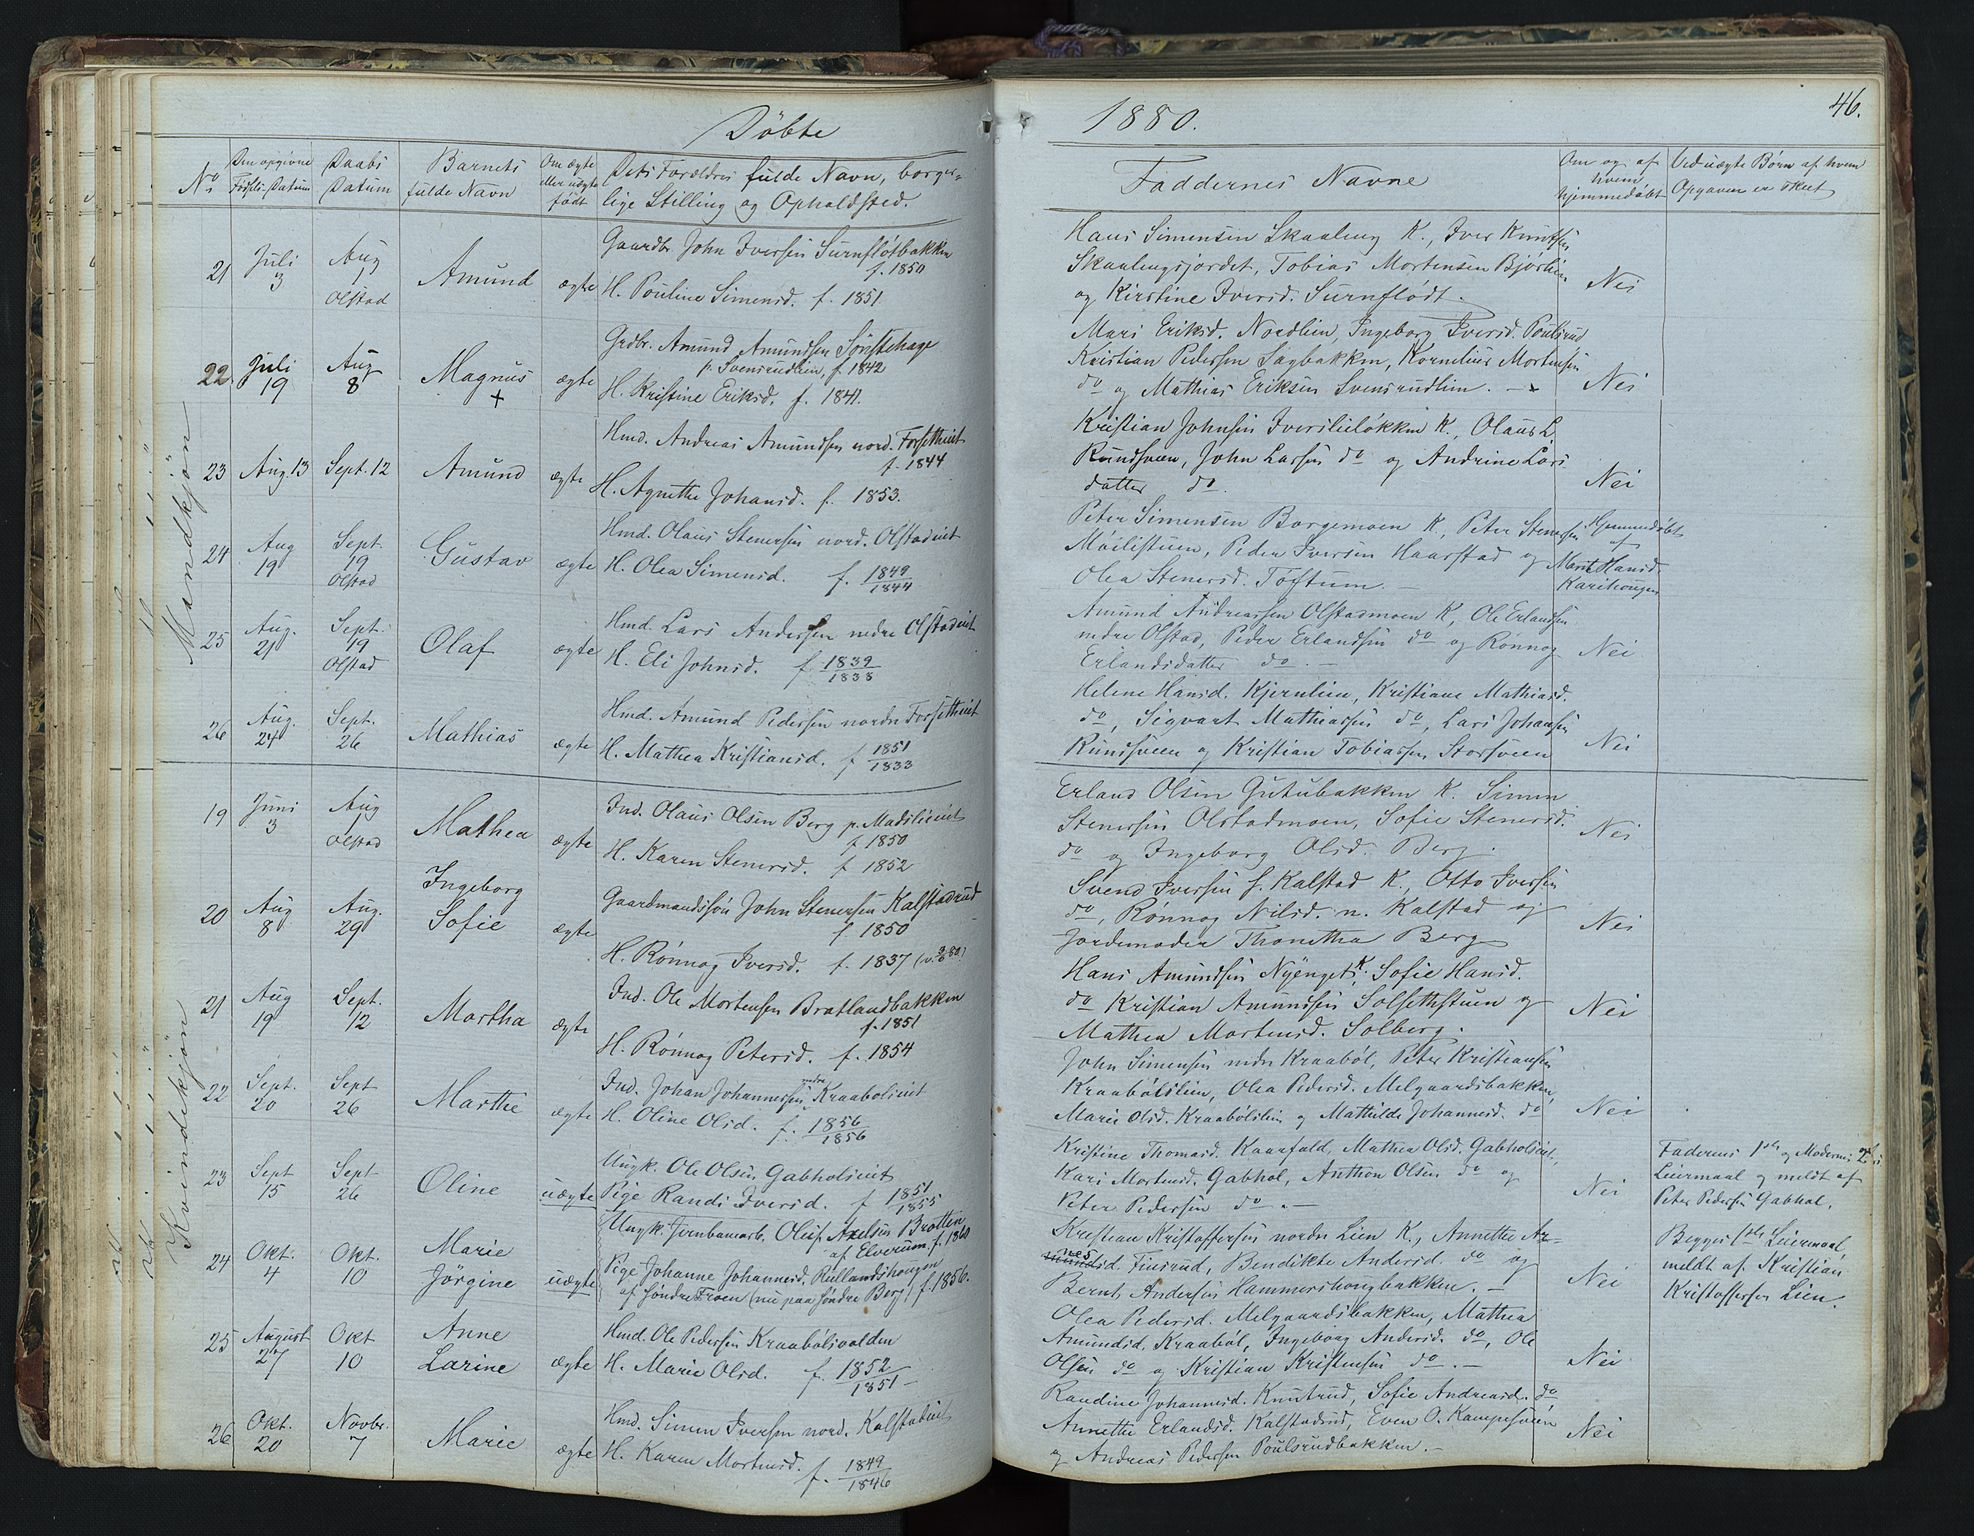 SAH, Vestre Gausdal prestekontor, Klokkerbok nr. 1, 1867-1895, s. 46